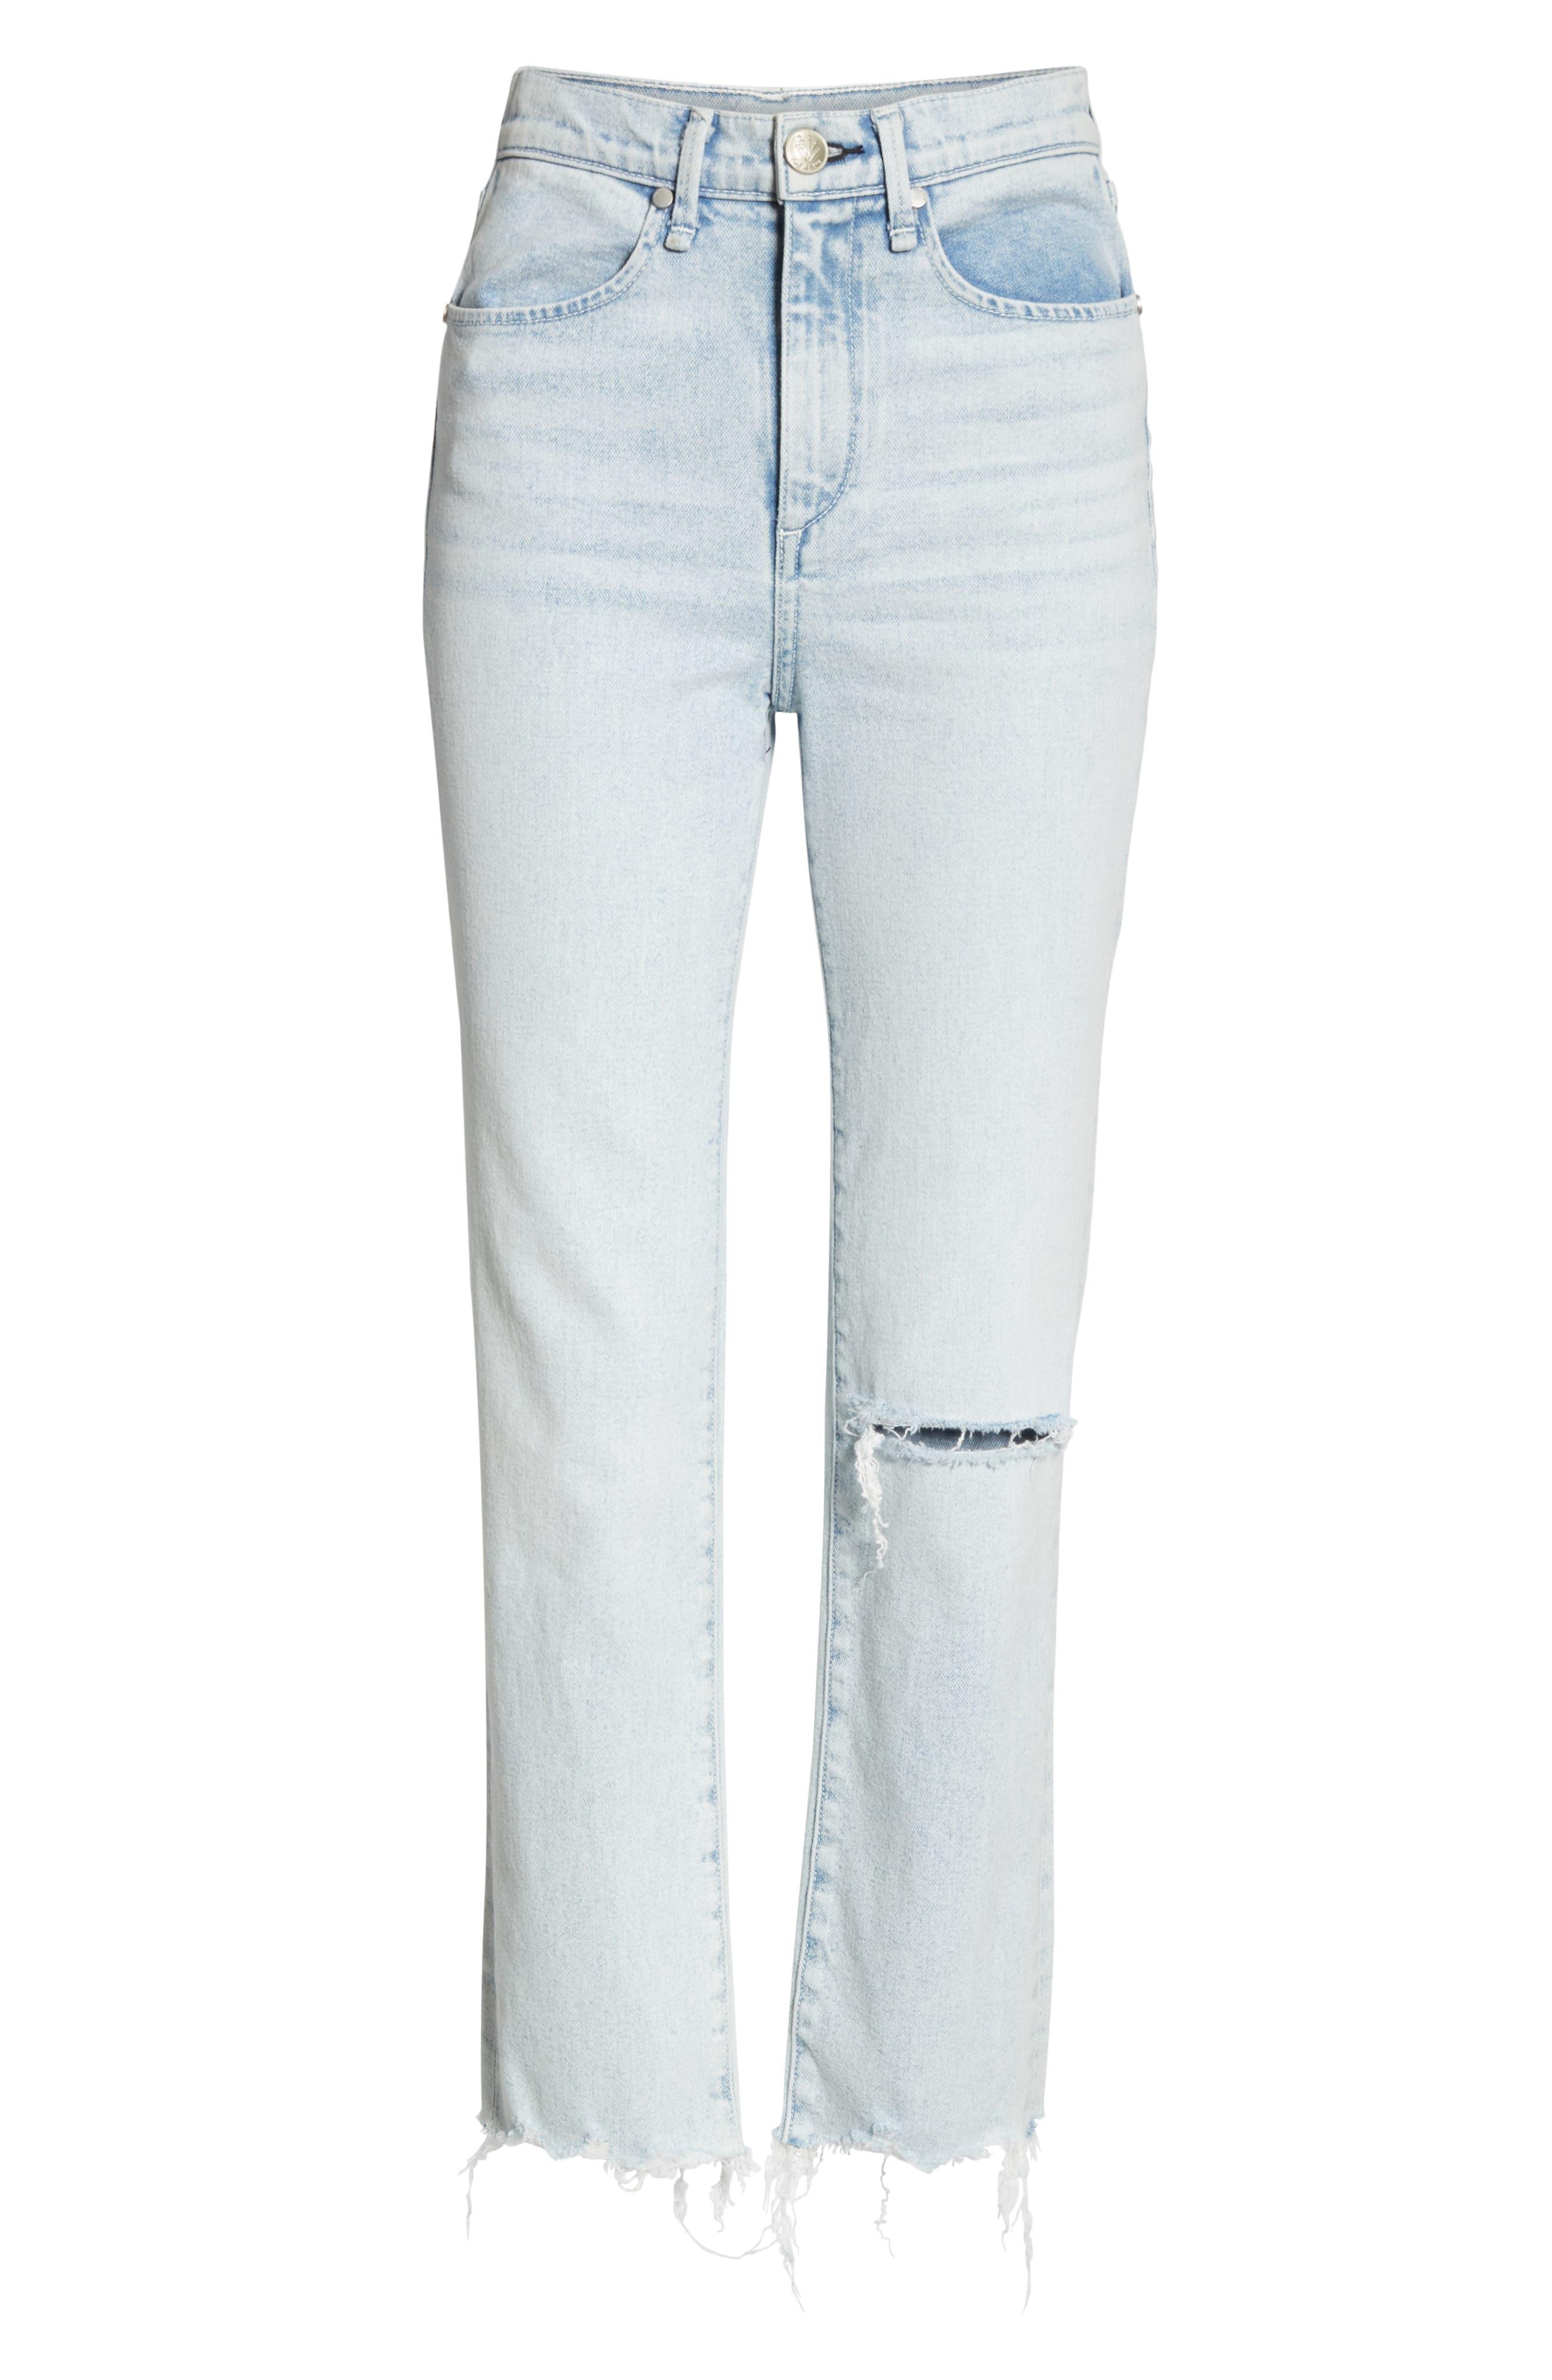 RAG & BONE, JEAN High Waist Ripped Ankle Cigarette Jeans, Alternate thumbnail 7, color, 450